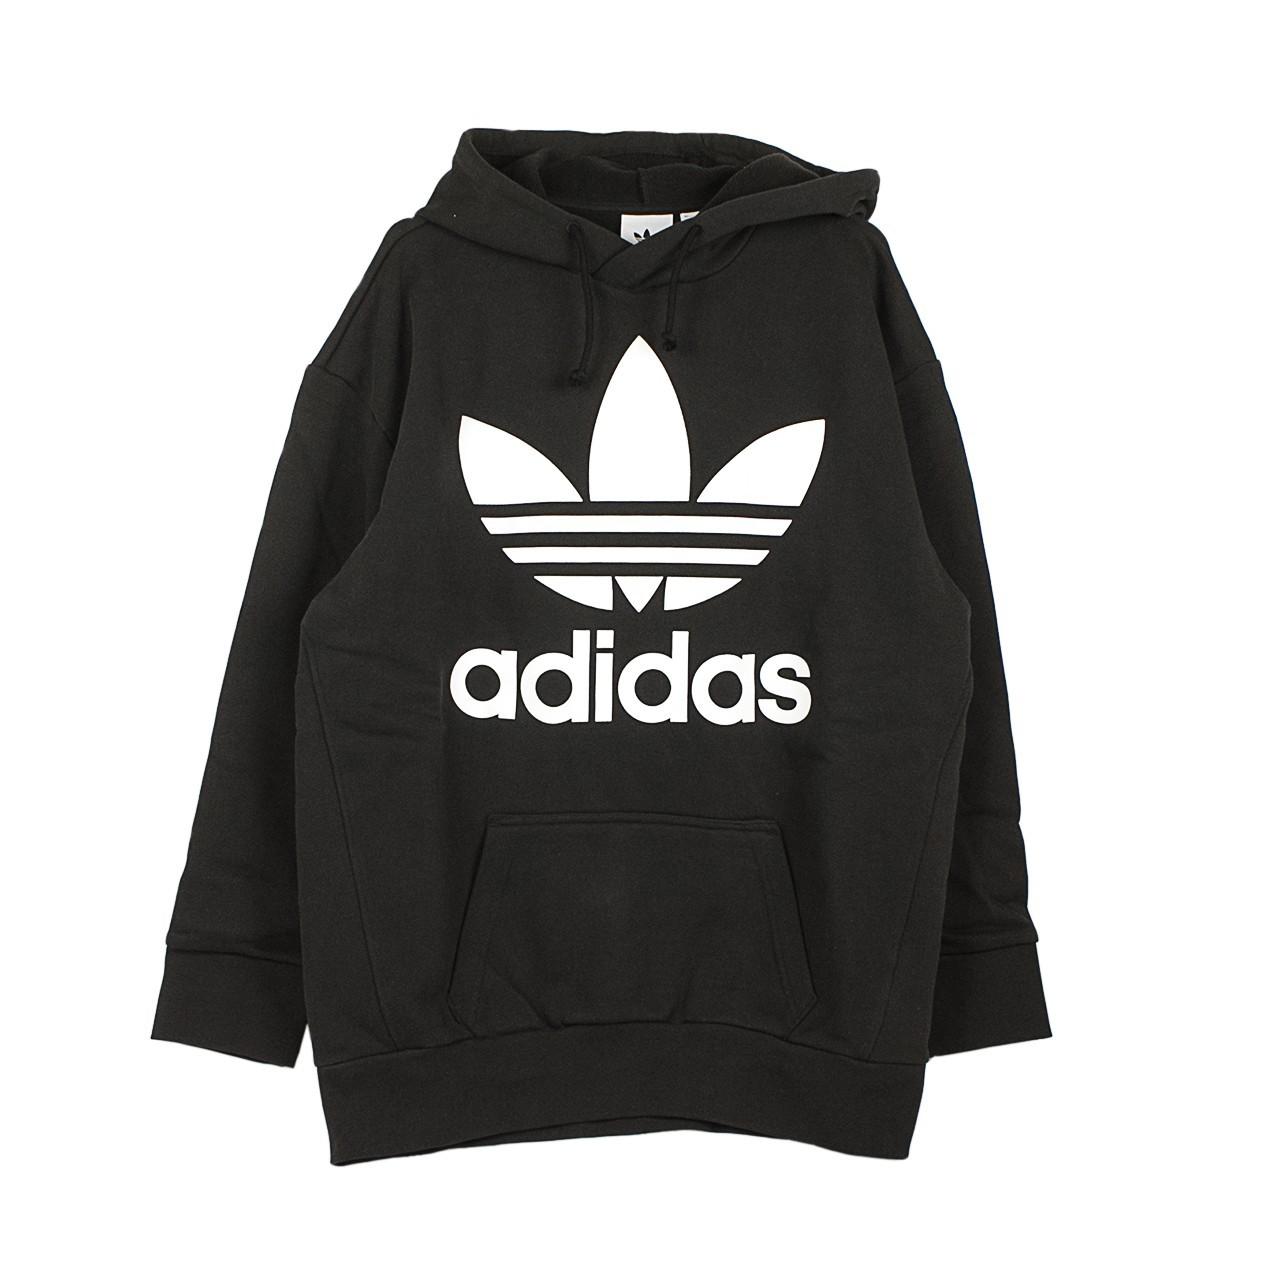 felpa adidas black and white